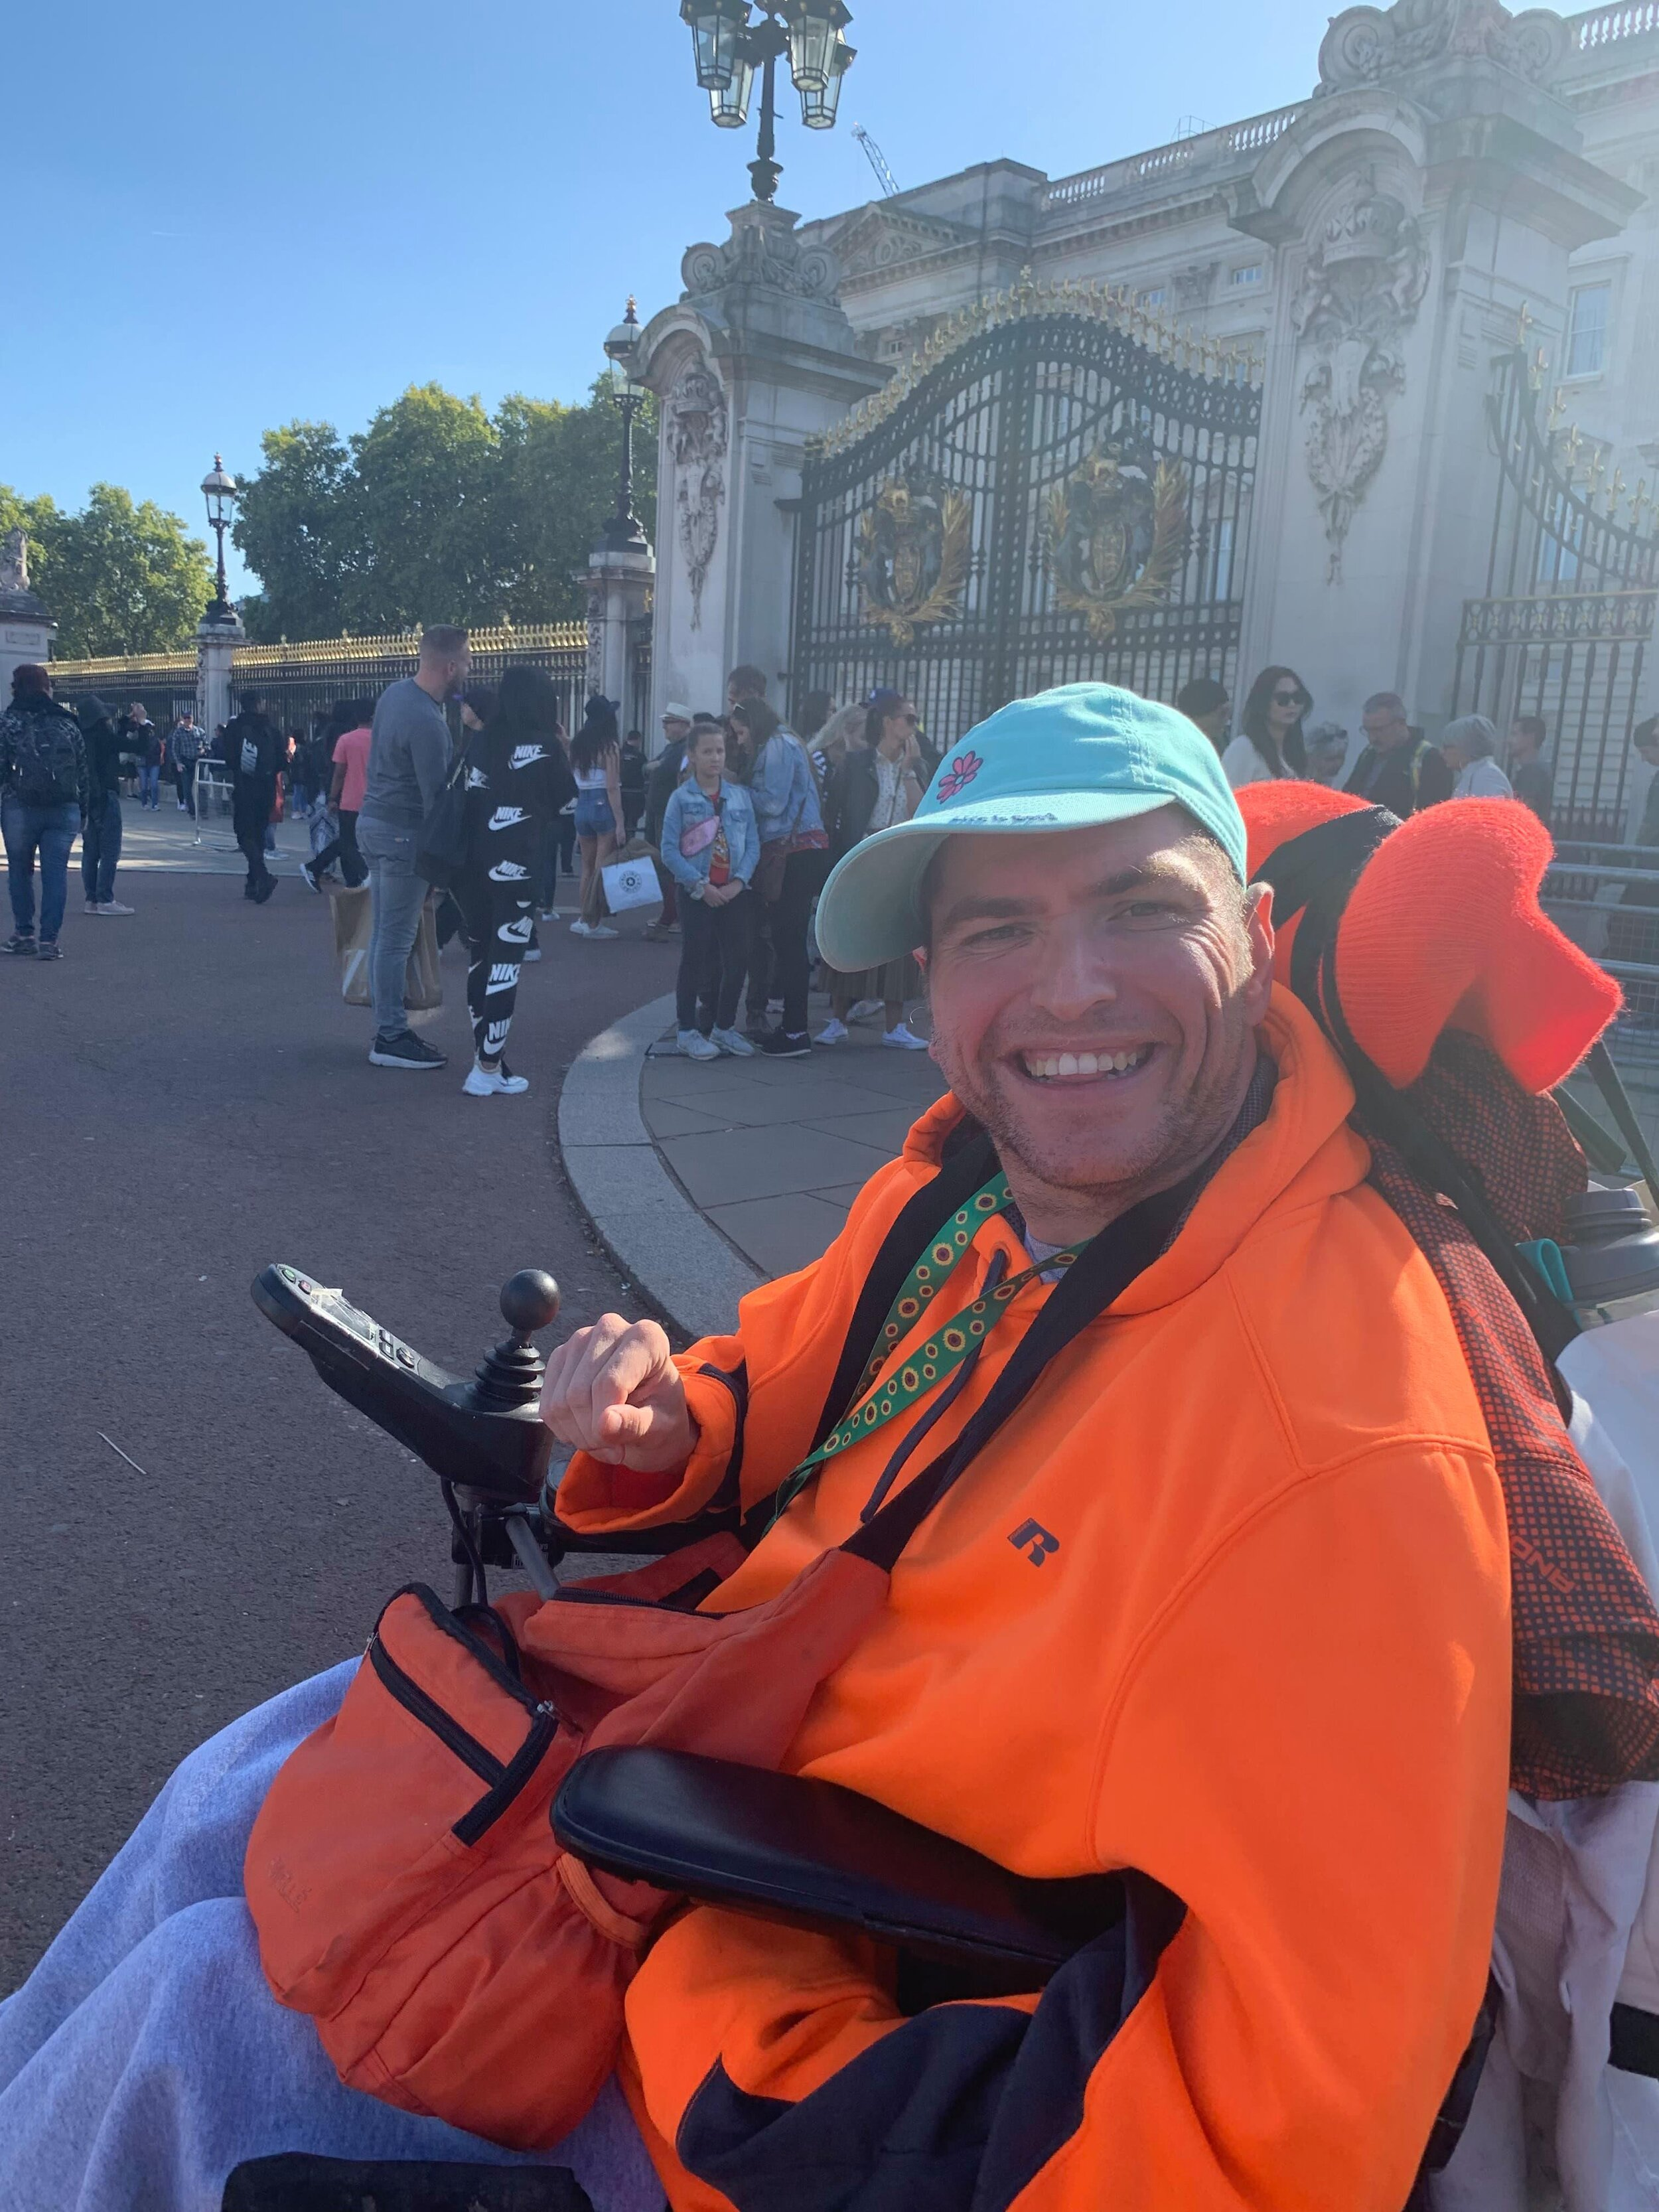 Andrew visiting Buckingham Palace in London, UK.